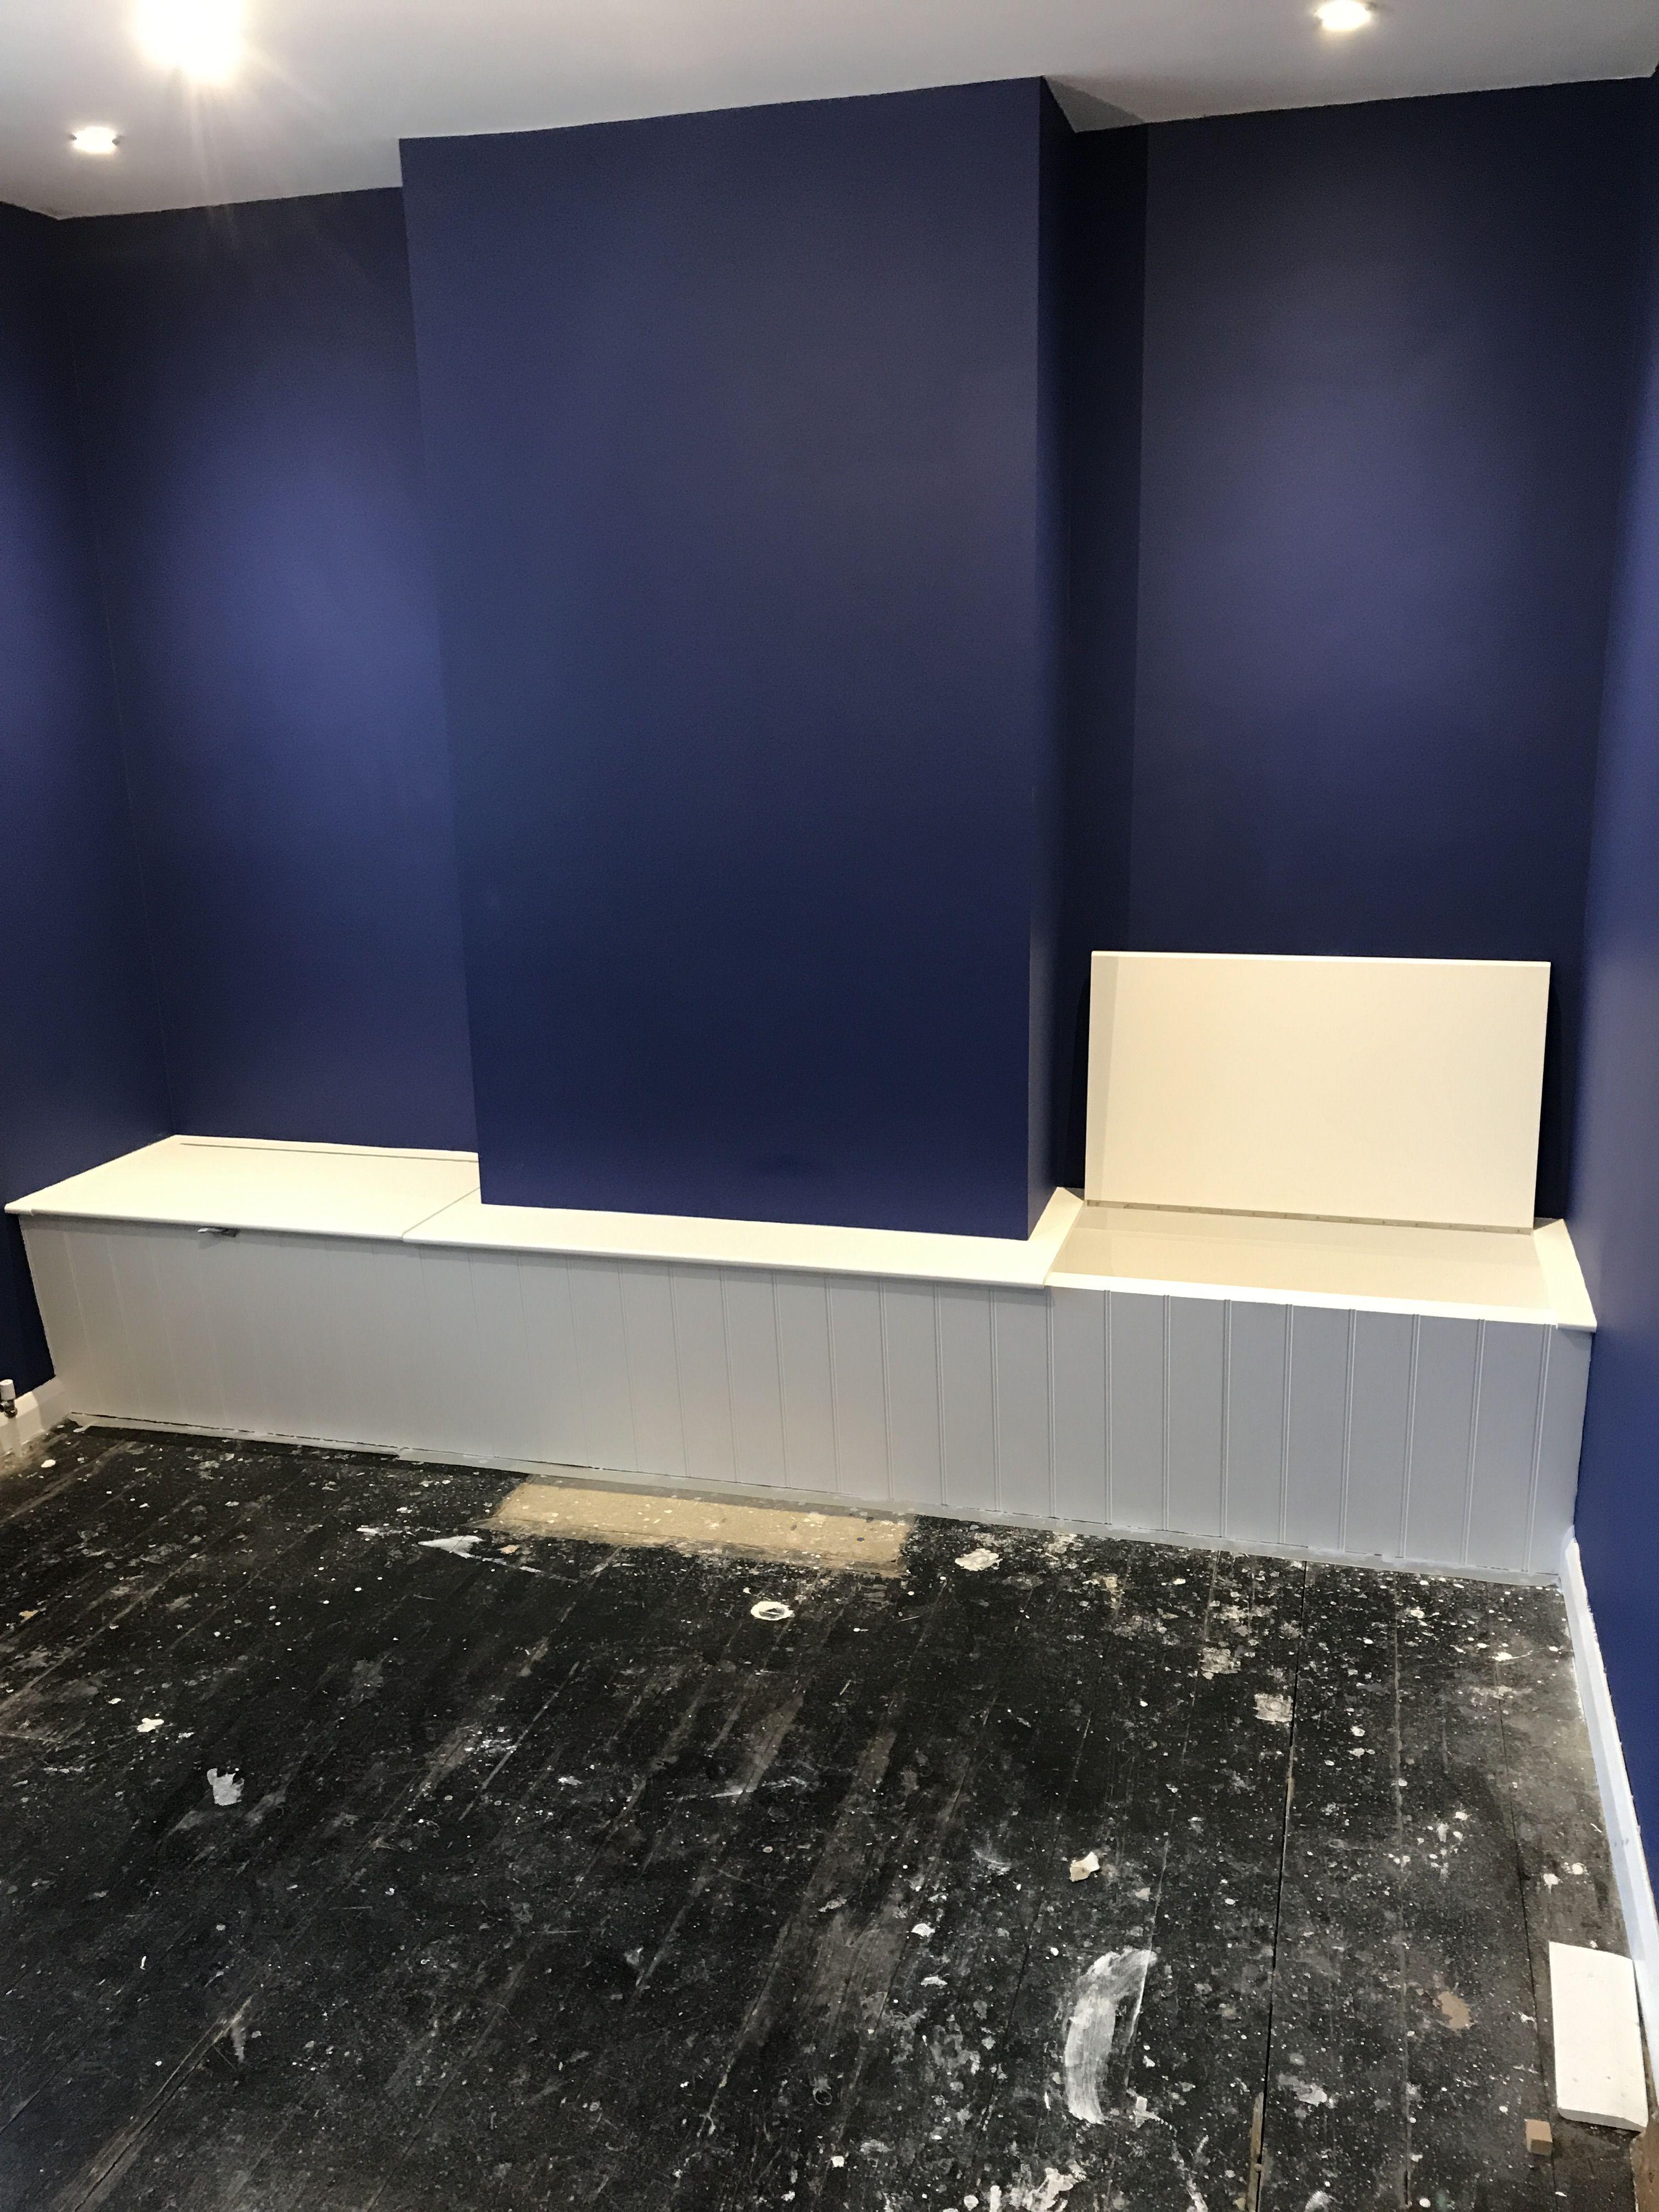 Alcove Bench Seat With Storage In Twickenham Storage Bench Seating Banquet Seating Lighted Bathroom Mirror